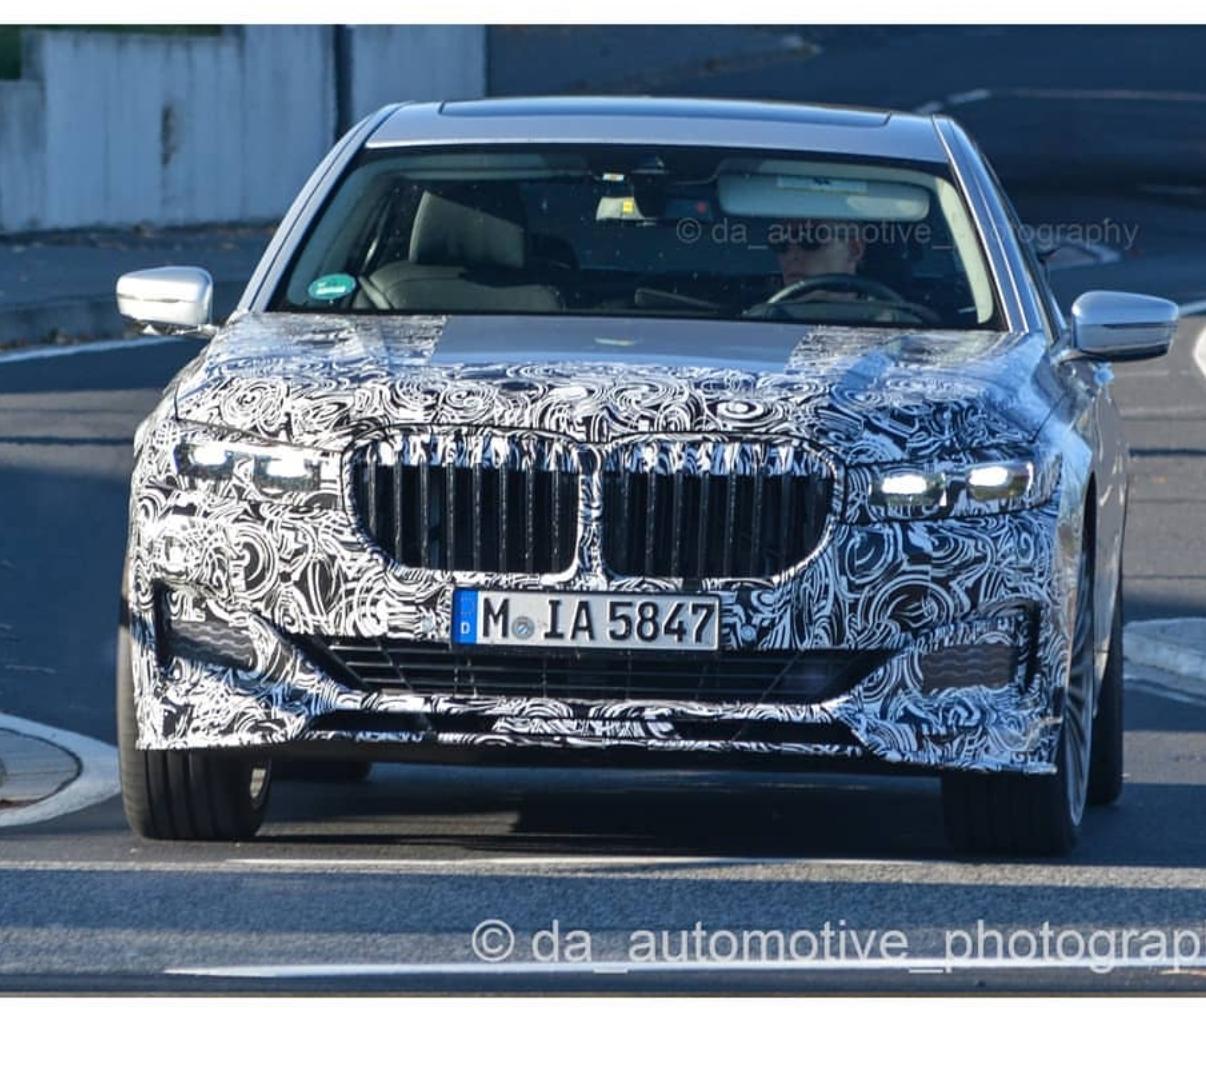 2019 - [BMW] Série 7 restylée  - Page 4 Attachment